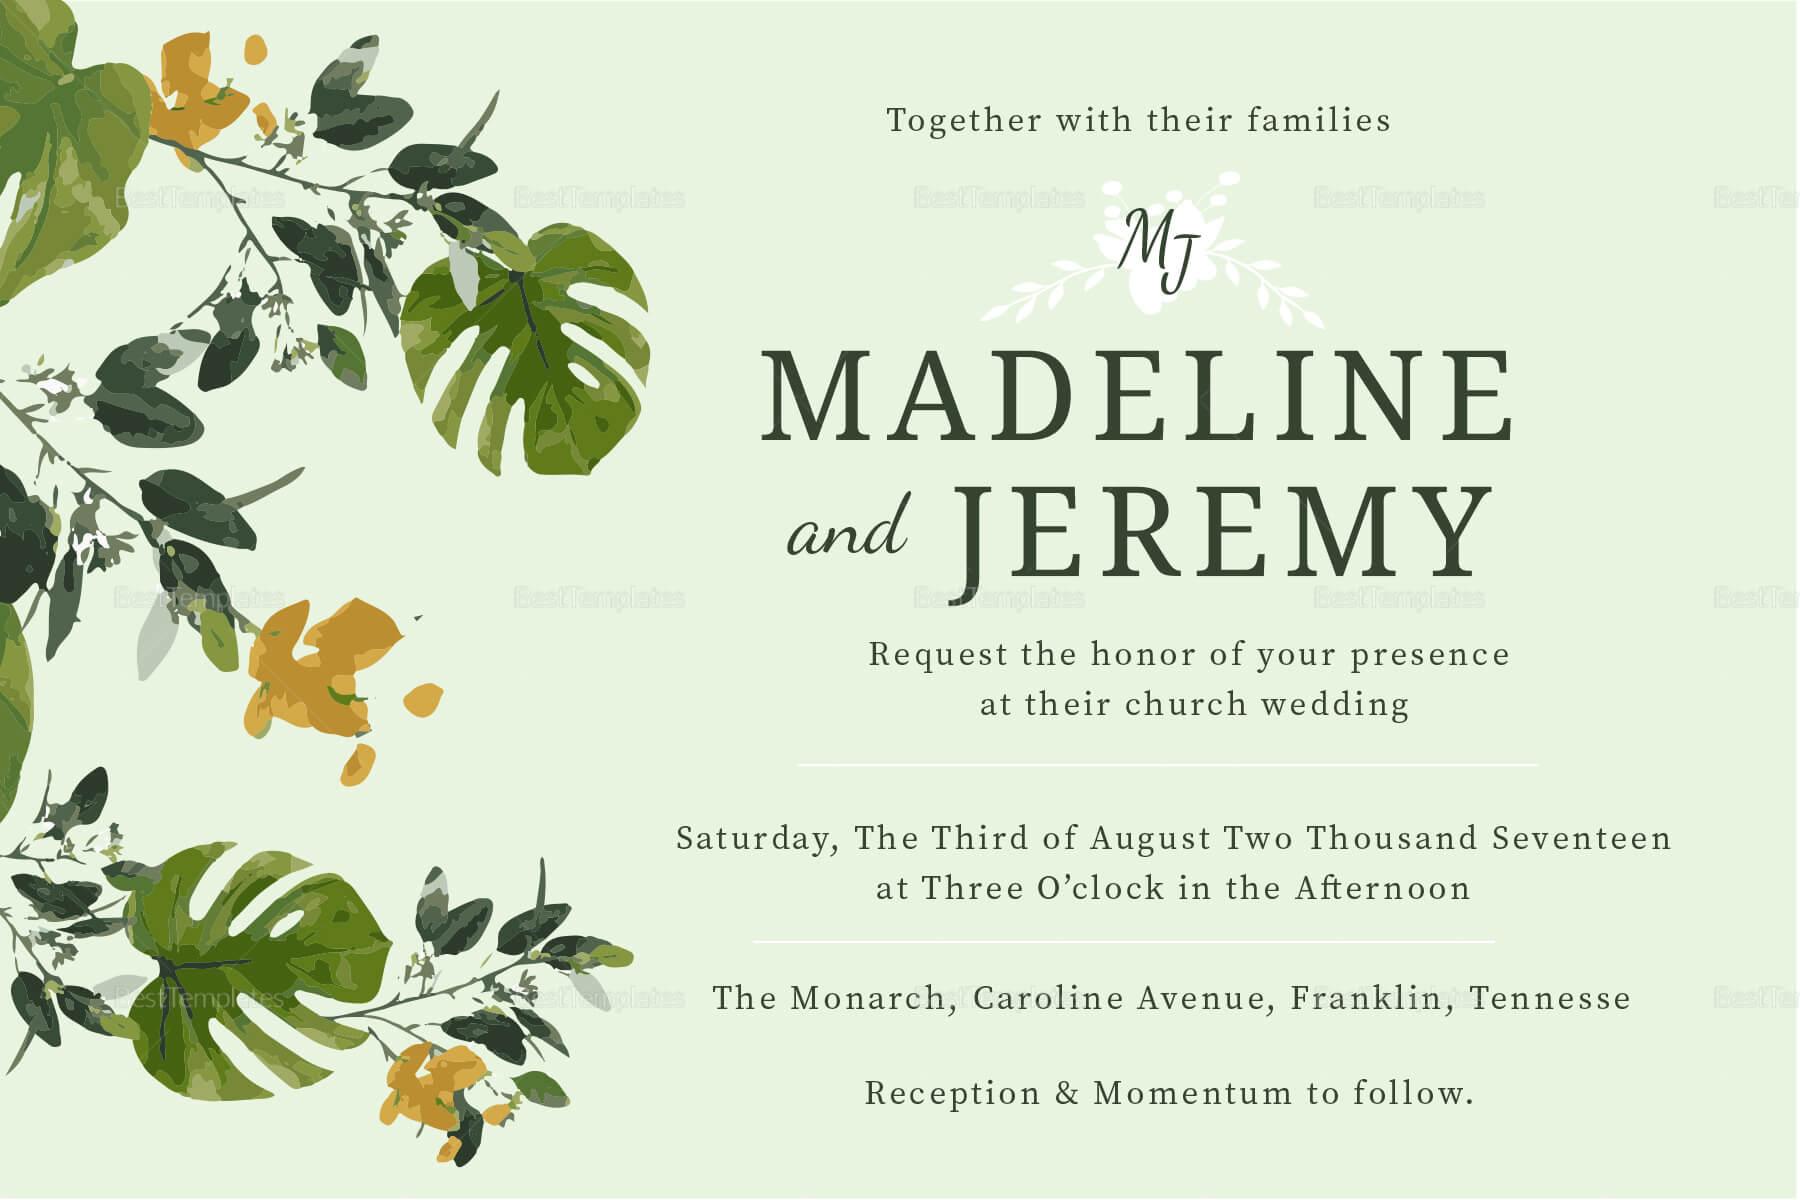 Church Wedding Invitation In Landscape And Portrait Inside Church Wedding Invitation Card Template